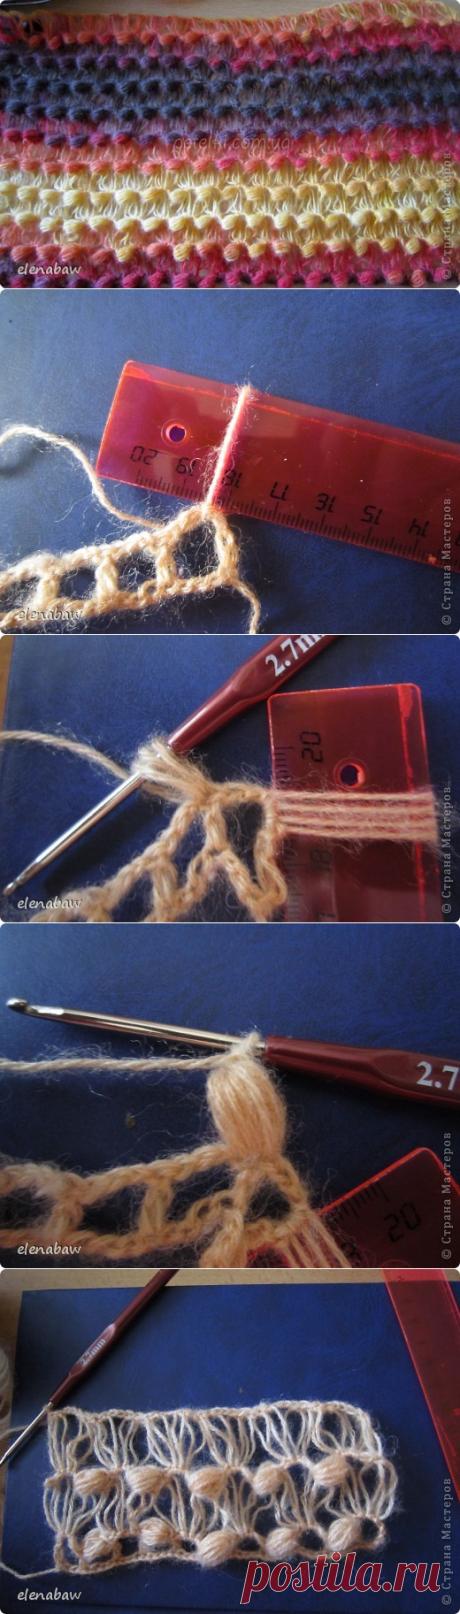 Вяжем крючком в технике брумстик. Мастеркласс